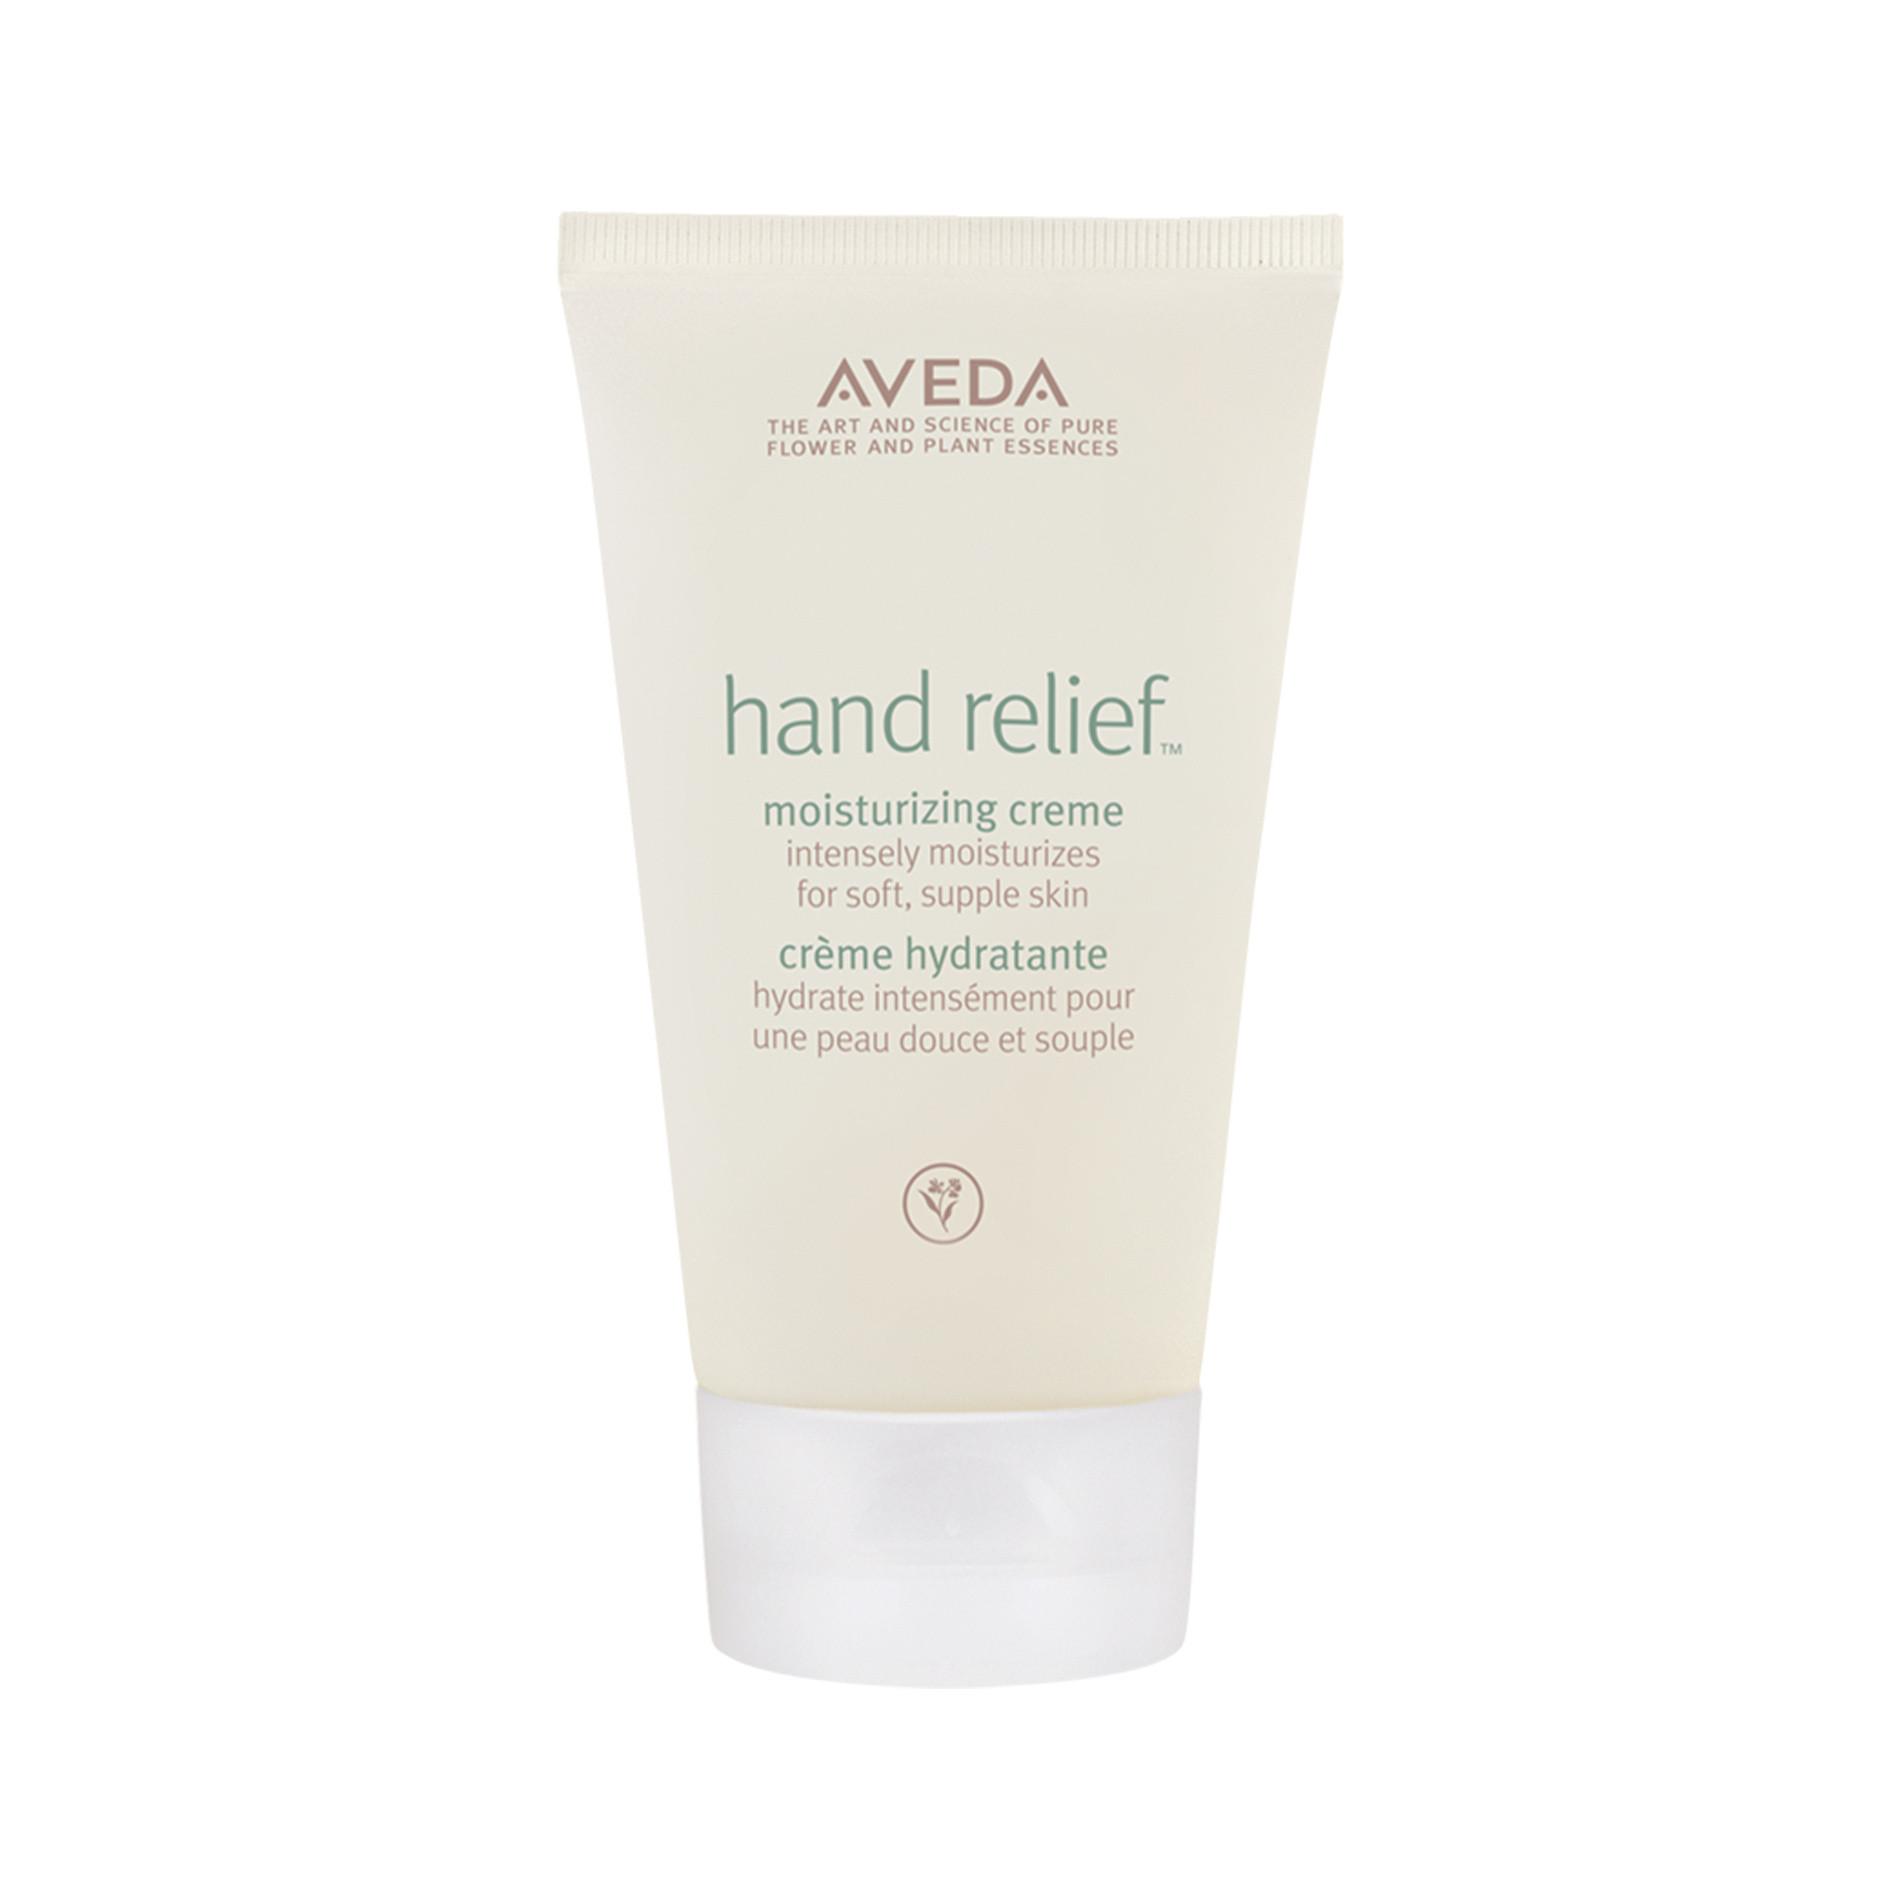 Aveda hand relief crema mani lenitiva 125 ml, Bianco, large image number 0